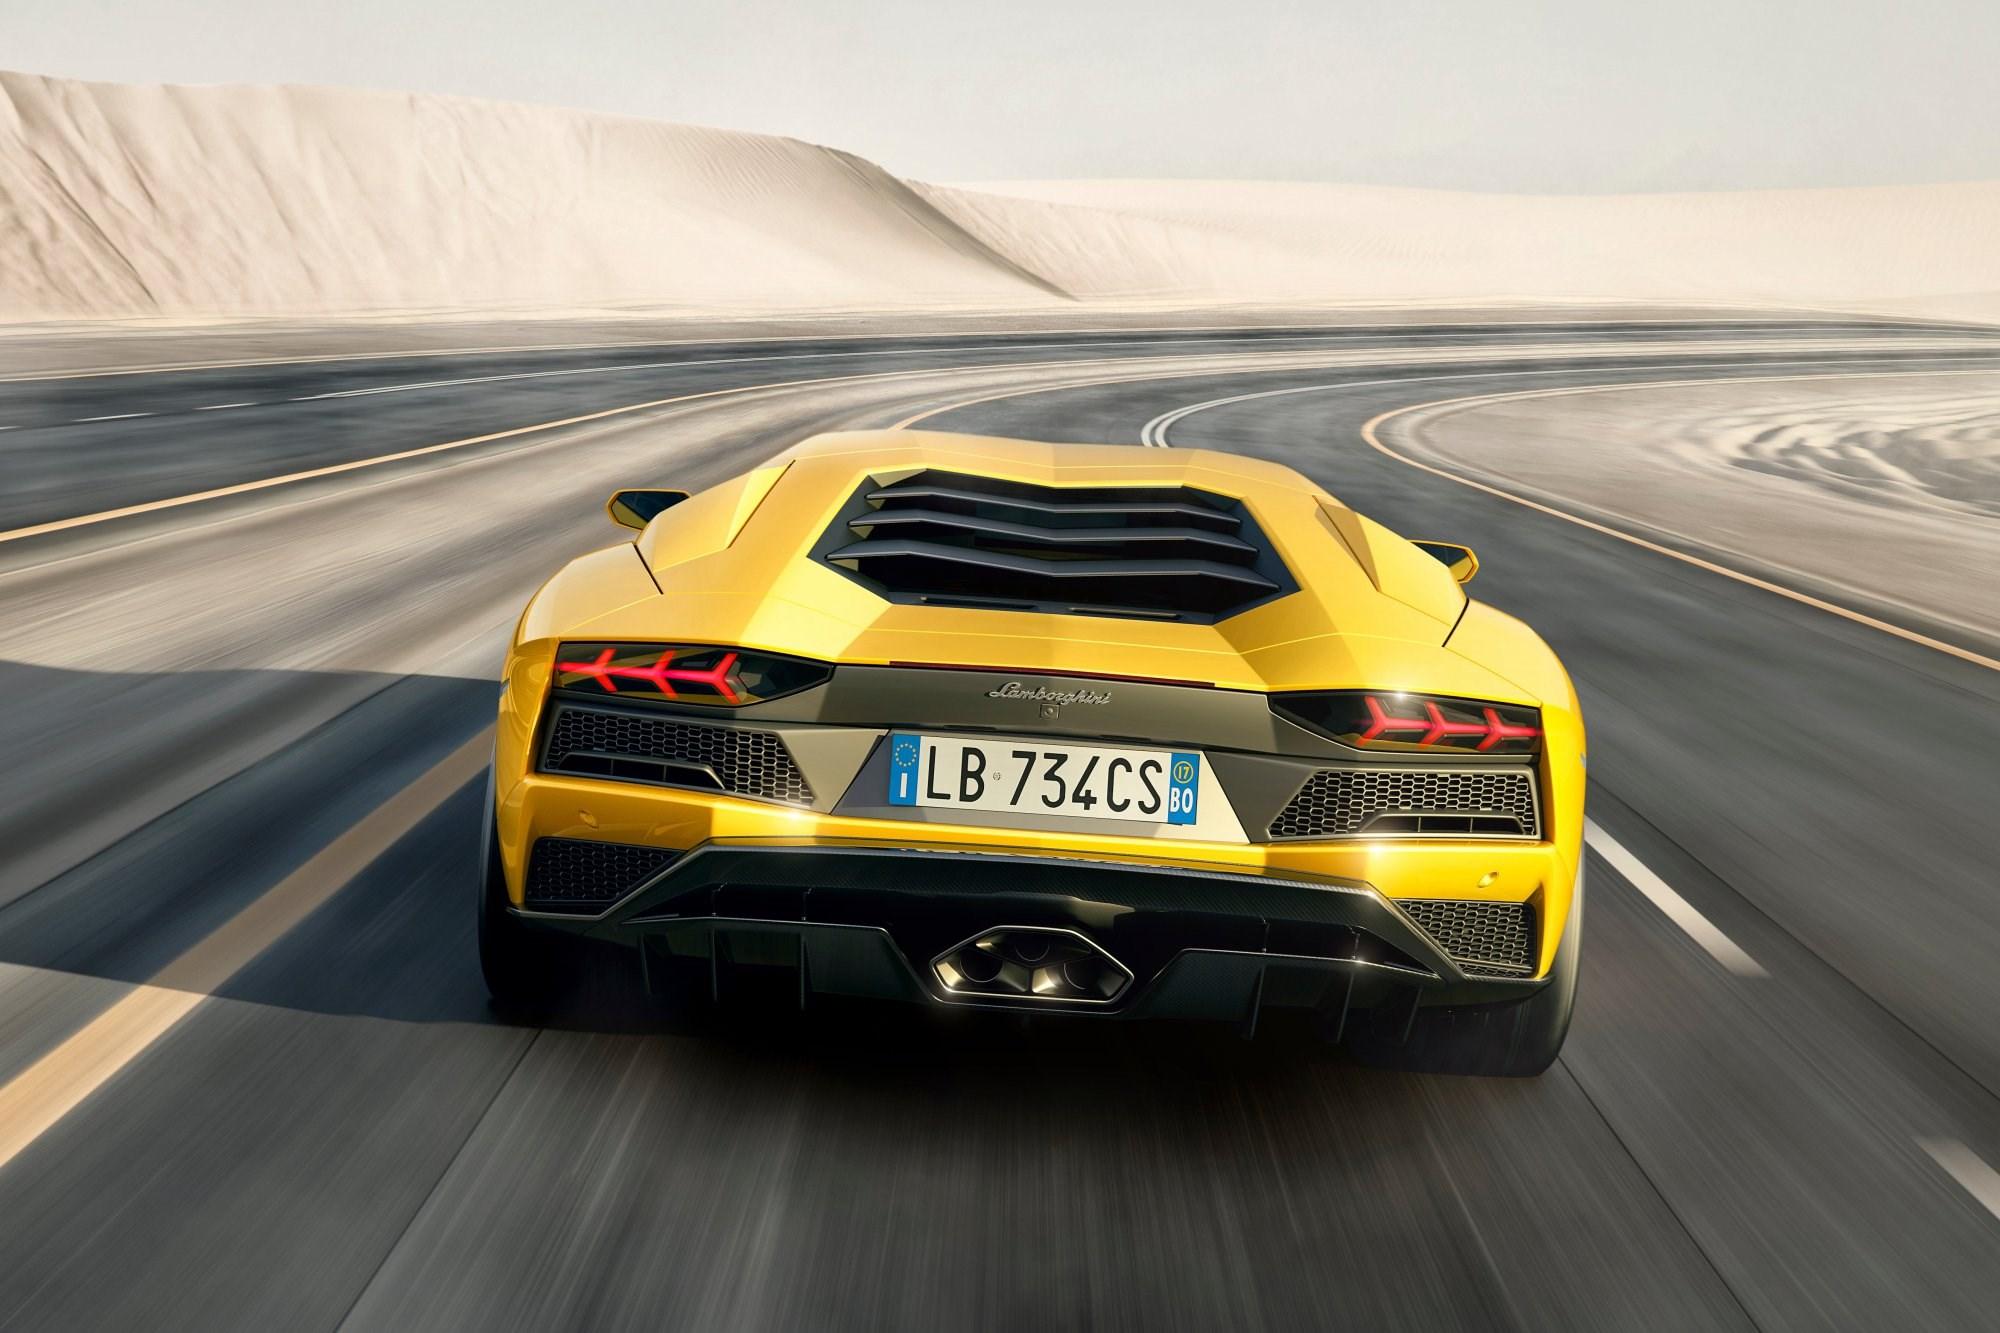 Lamborghini Unveils 2017 Aventador S Thumbnail